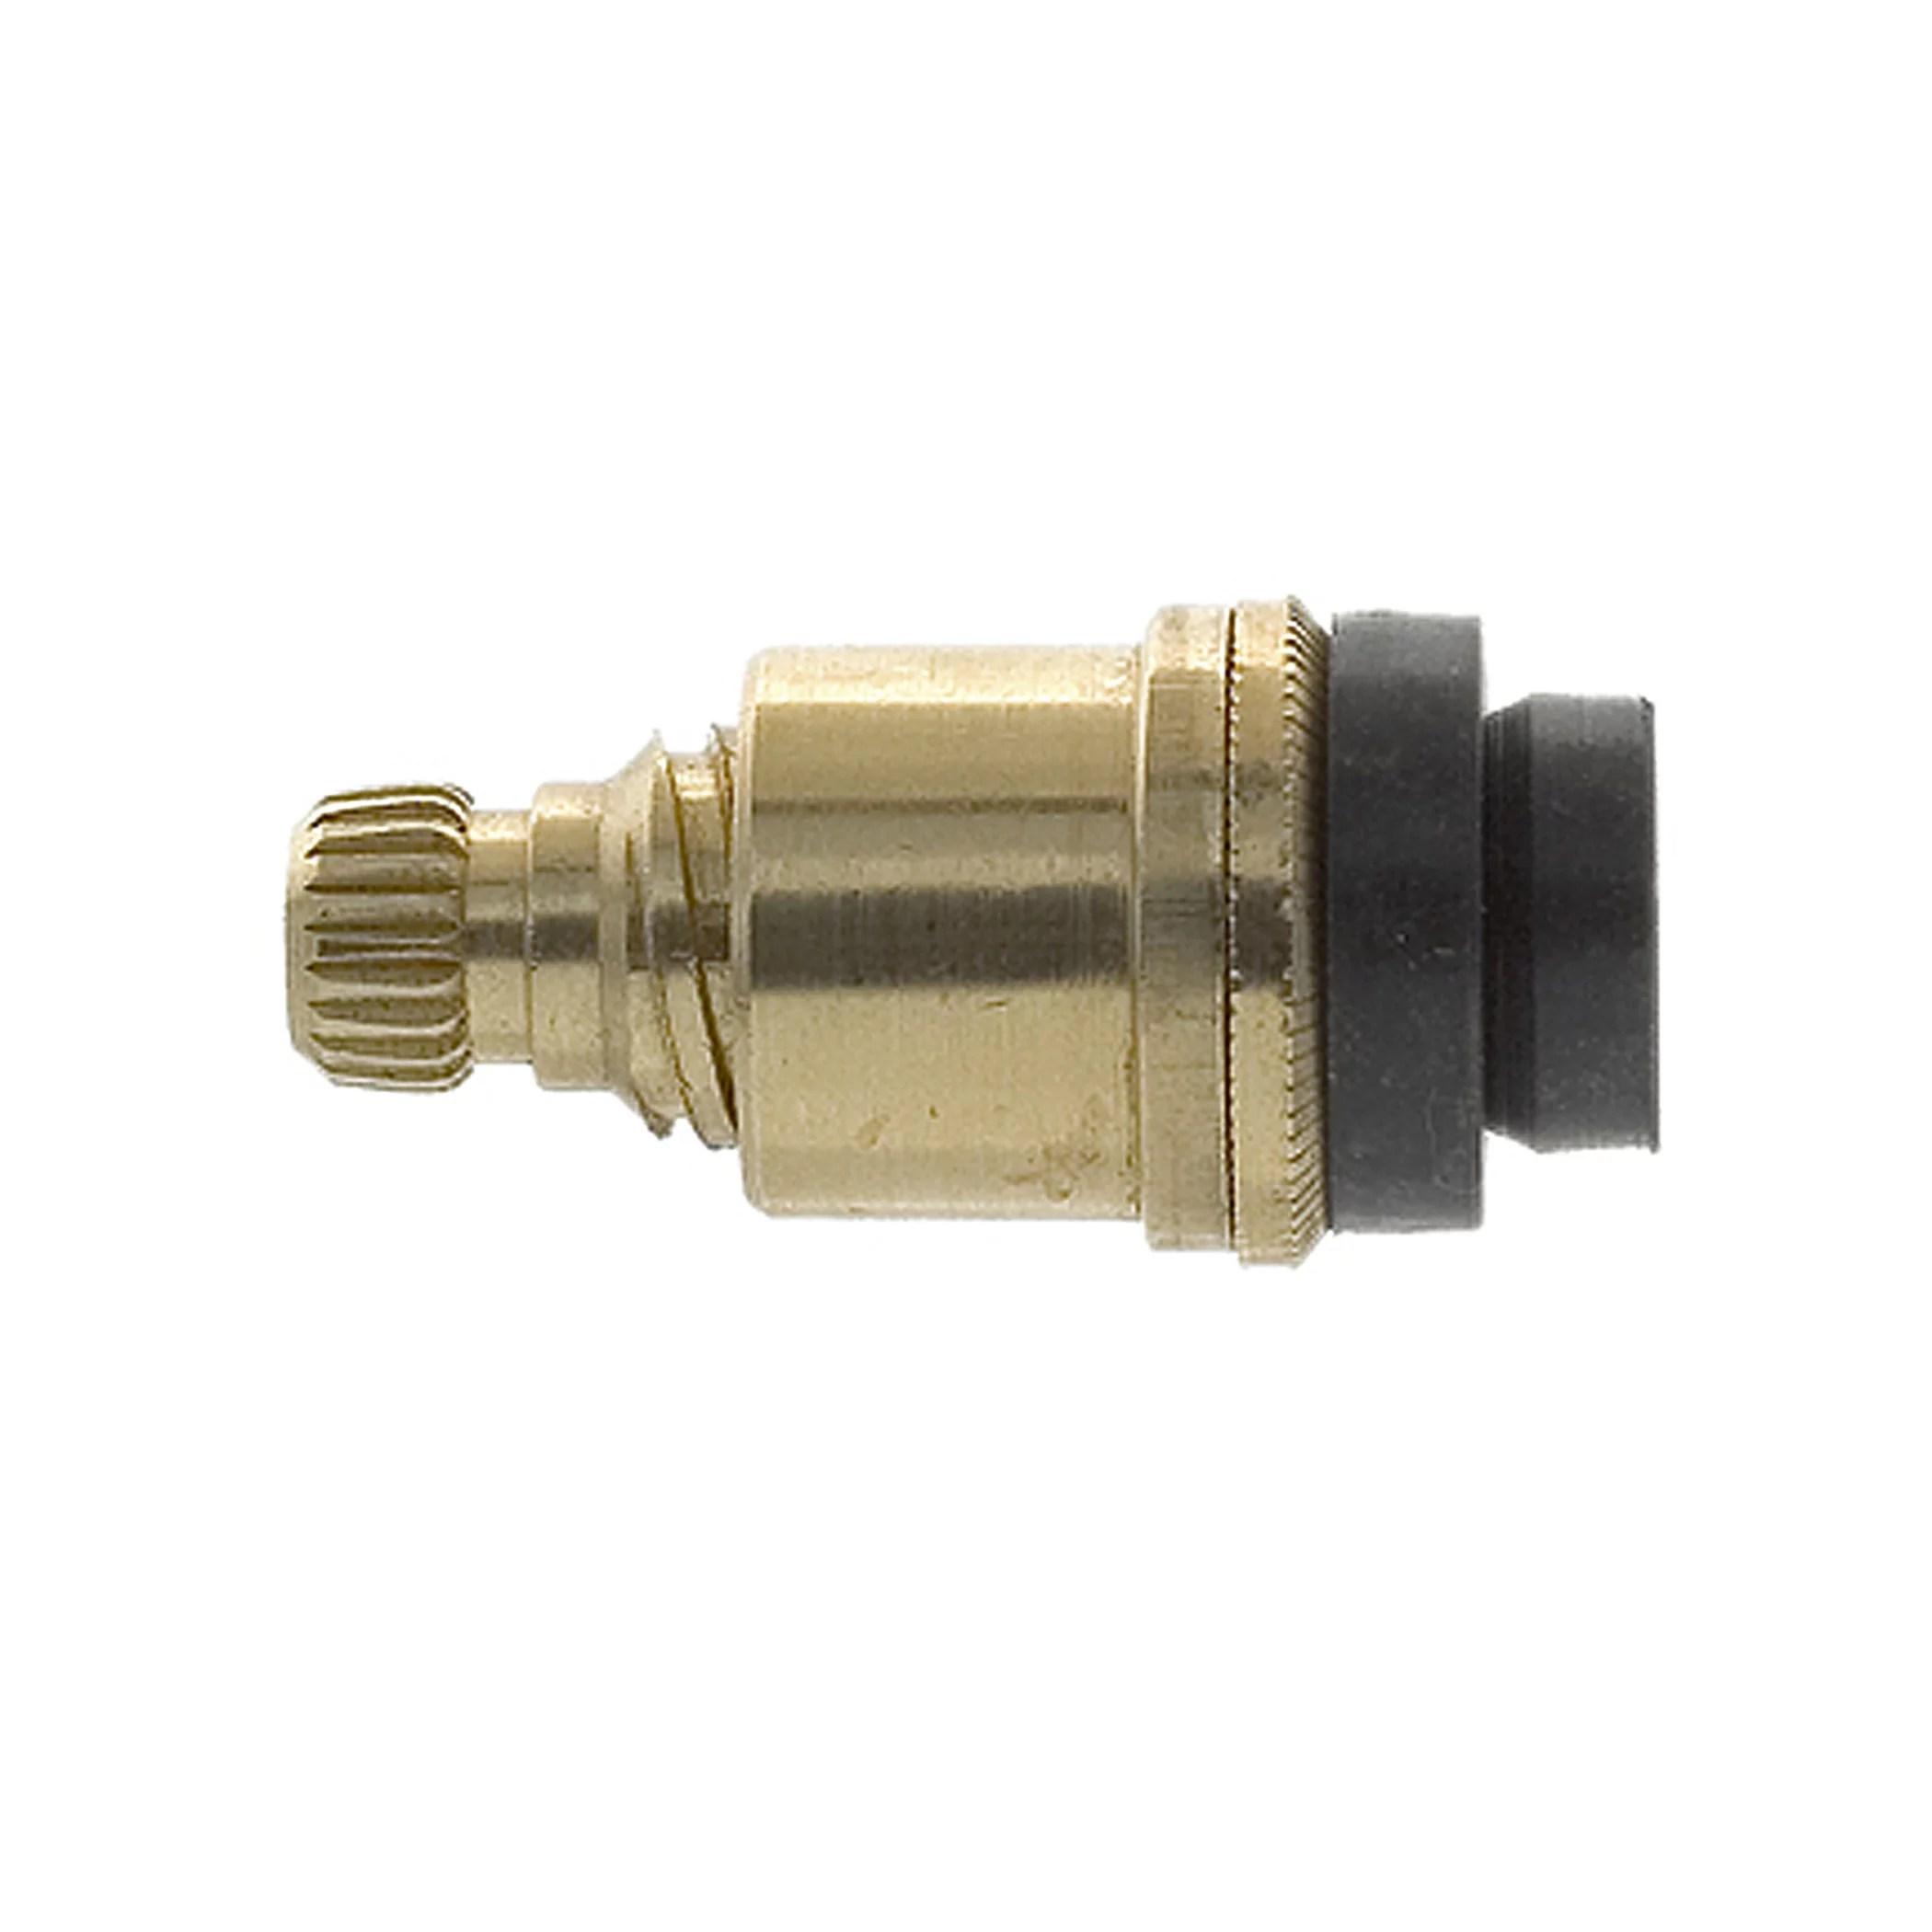 danco 2k 2h hot stem for american standard sink and tub shower faucets 15729e walmart com